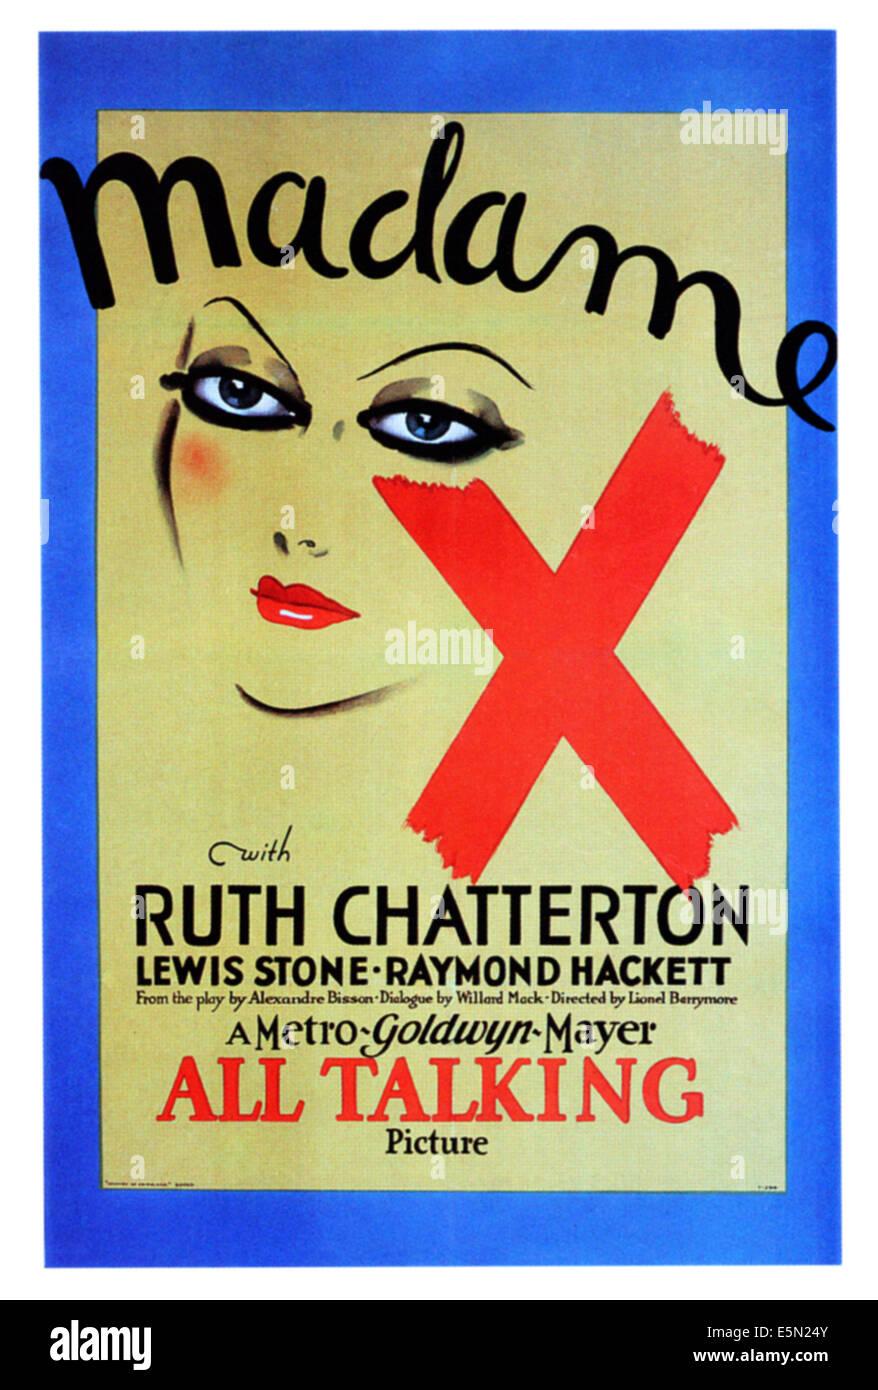 MADAME X, locandina, 1929 Immagini Stock